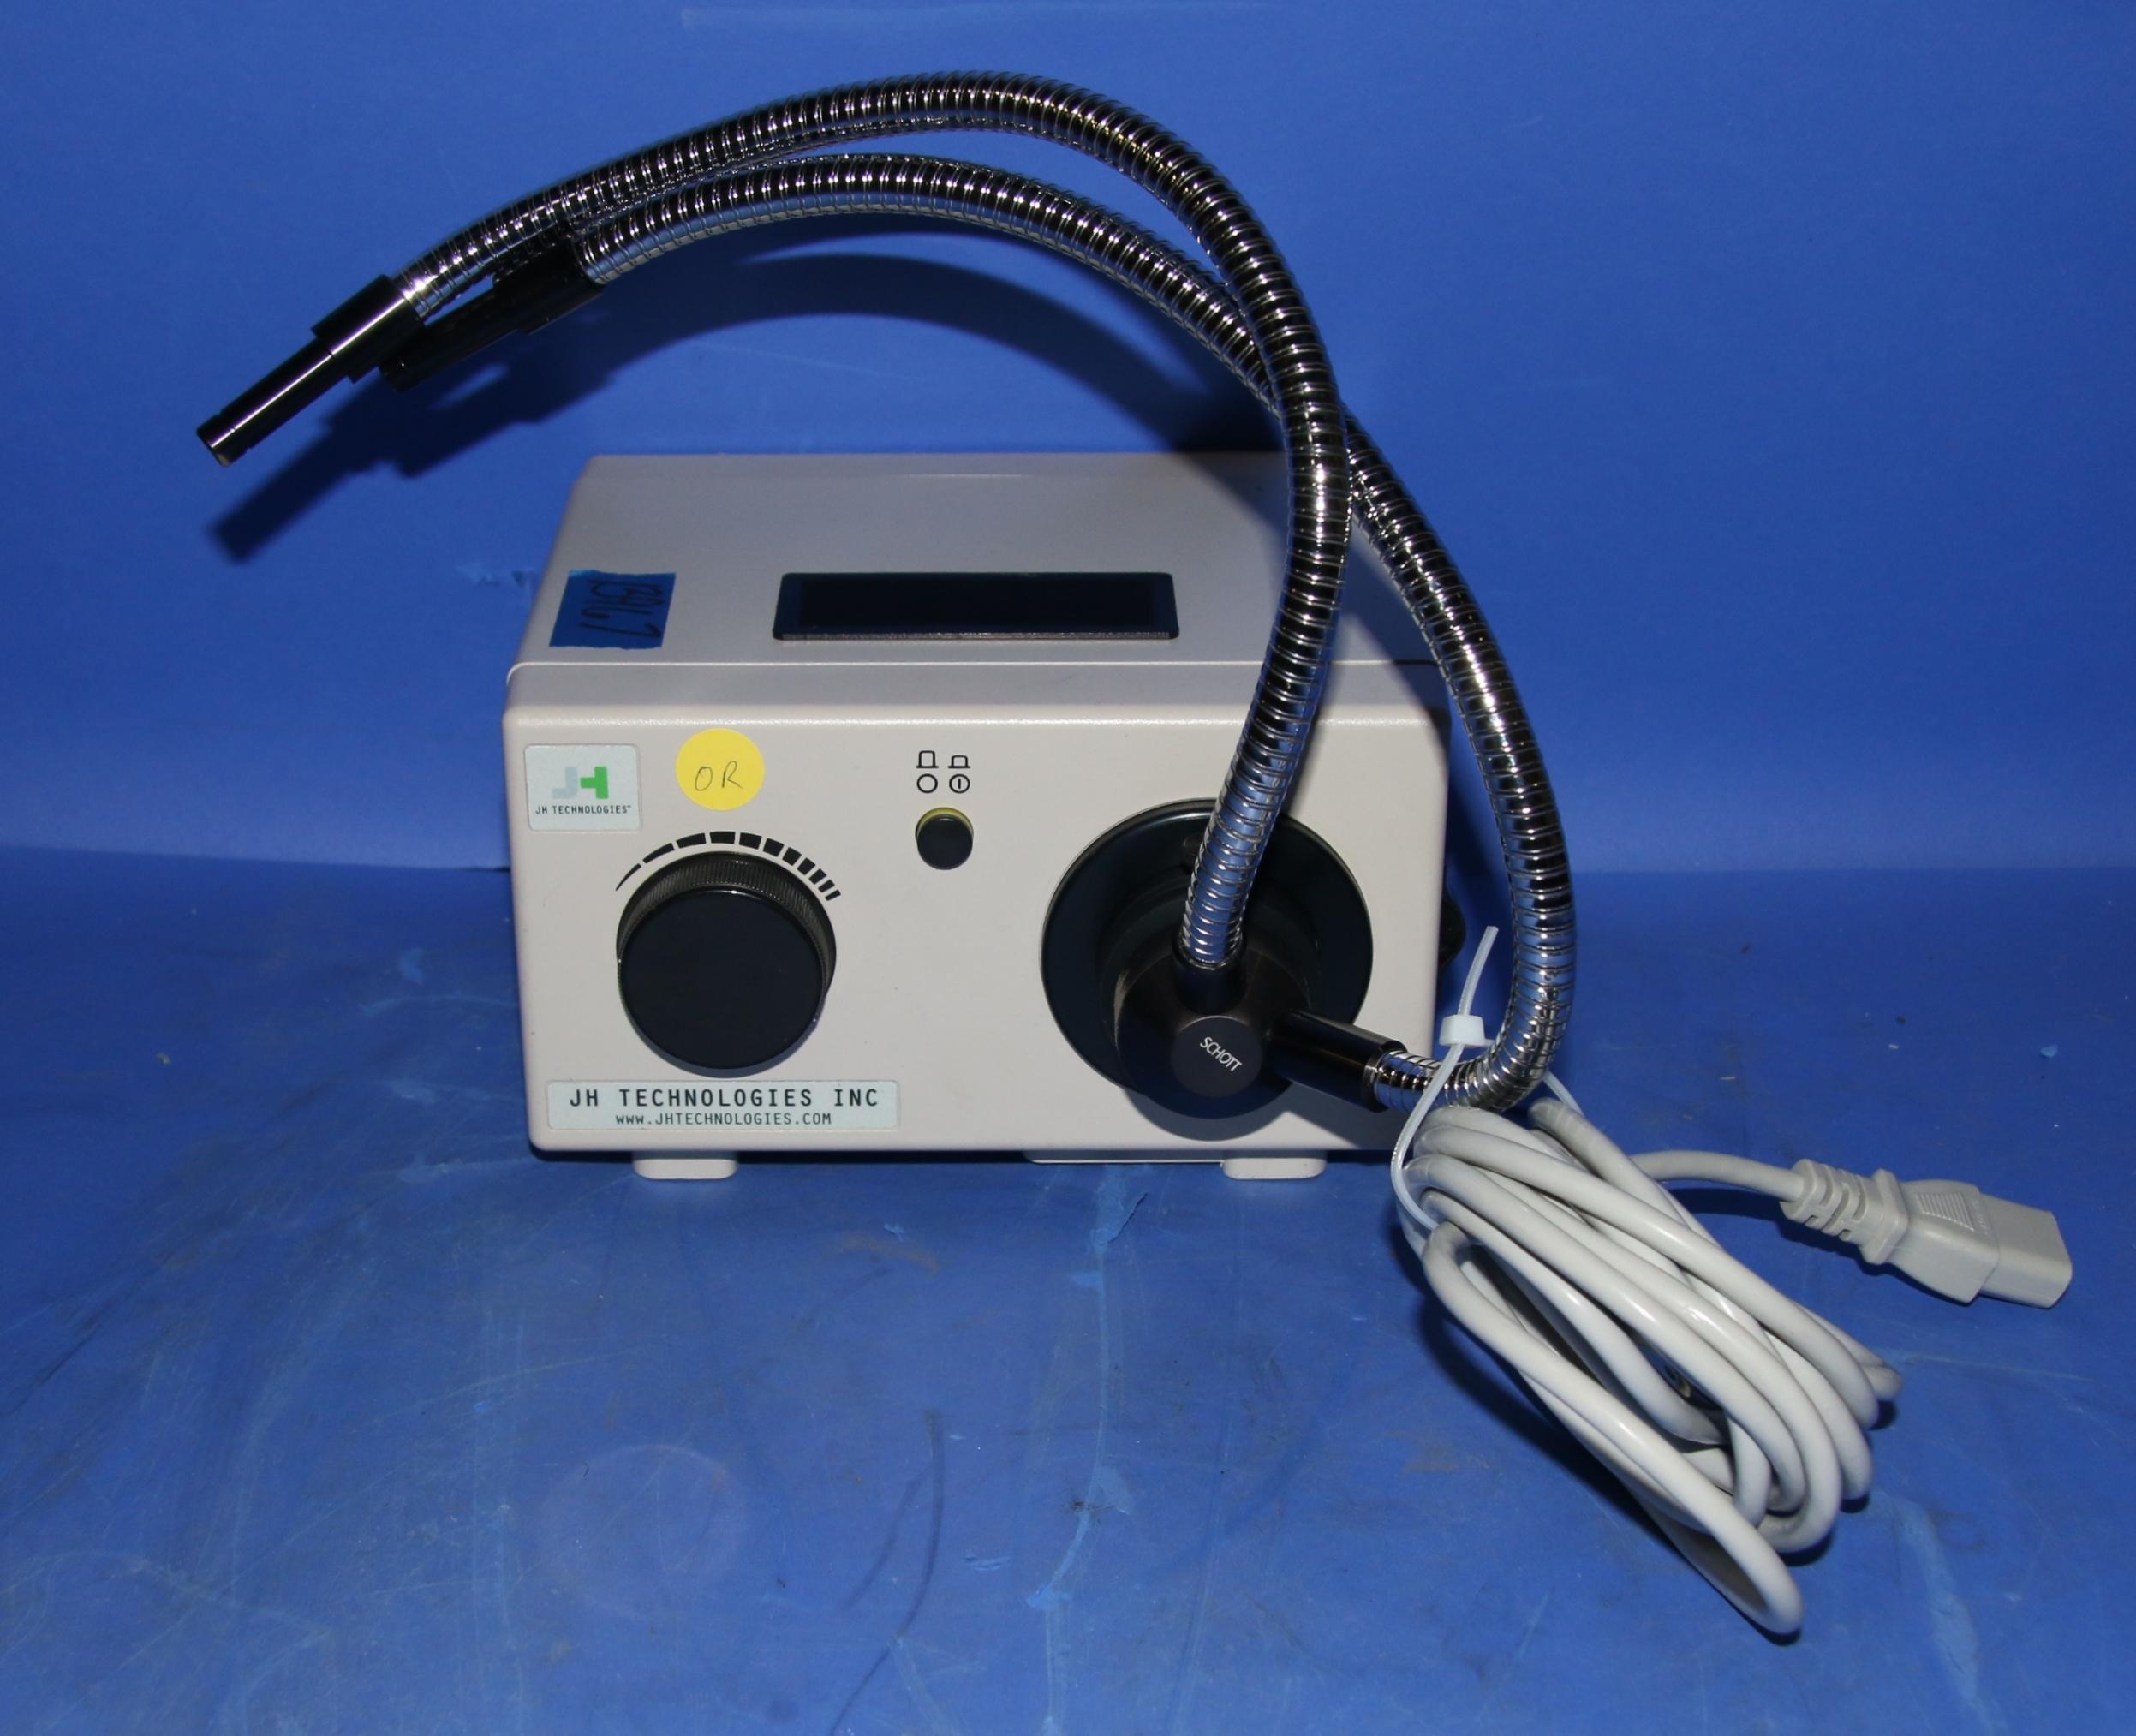 (1) Used JH Technologies MO150 Fiber Optic Illuminator With Split Light Wand